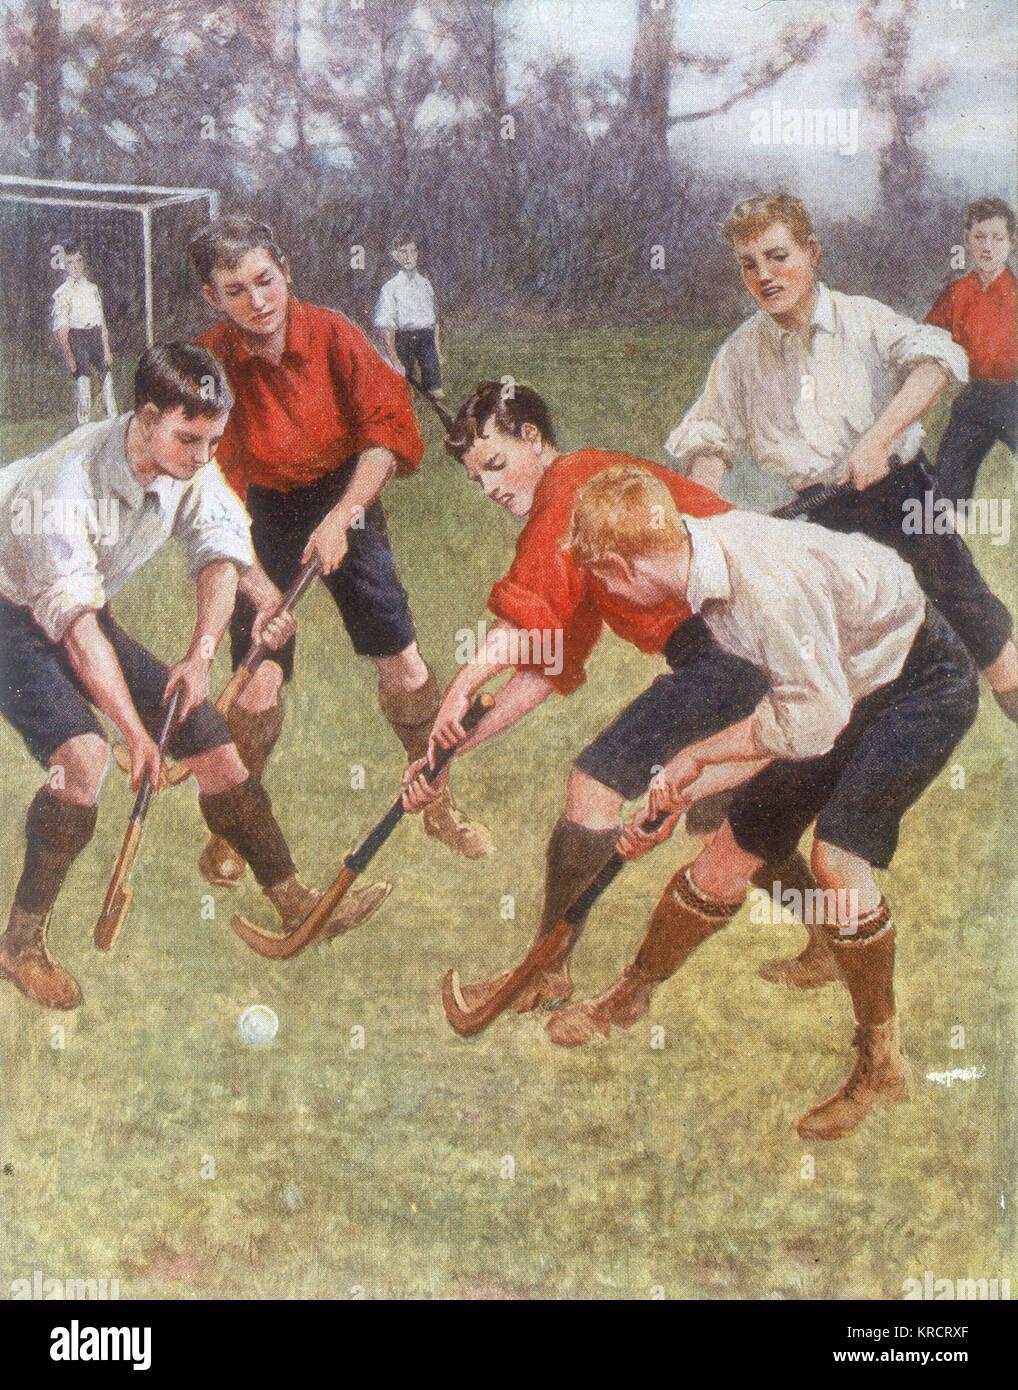 Un Boys' hockey Fecha: 1908 Imagen De Stock